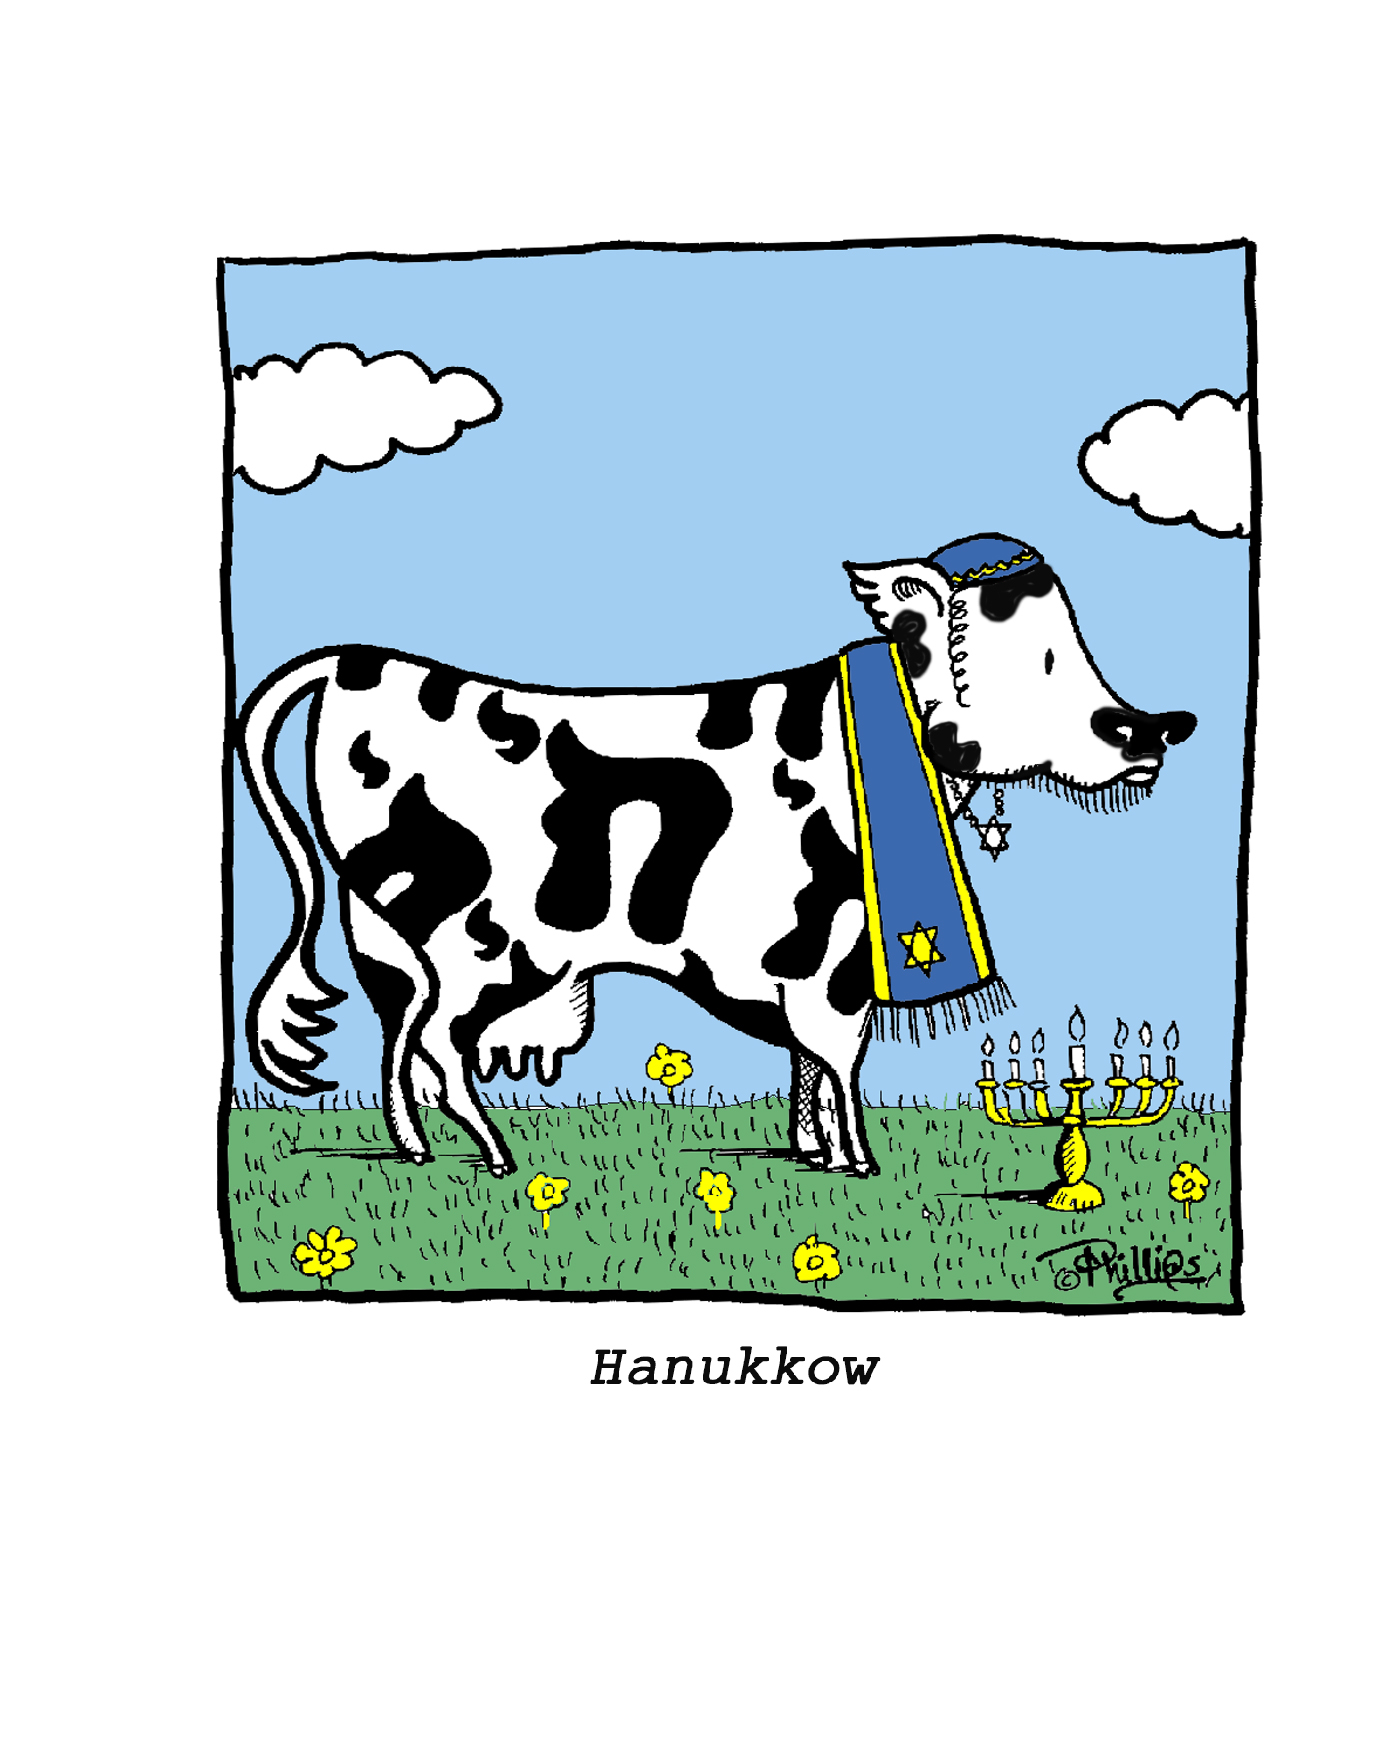 HANNKKOW-GREET CARD copy.jpg